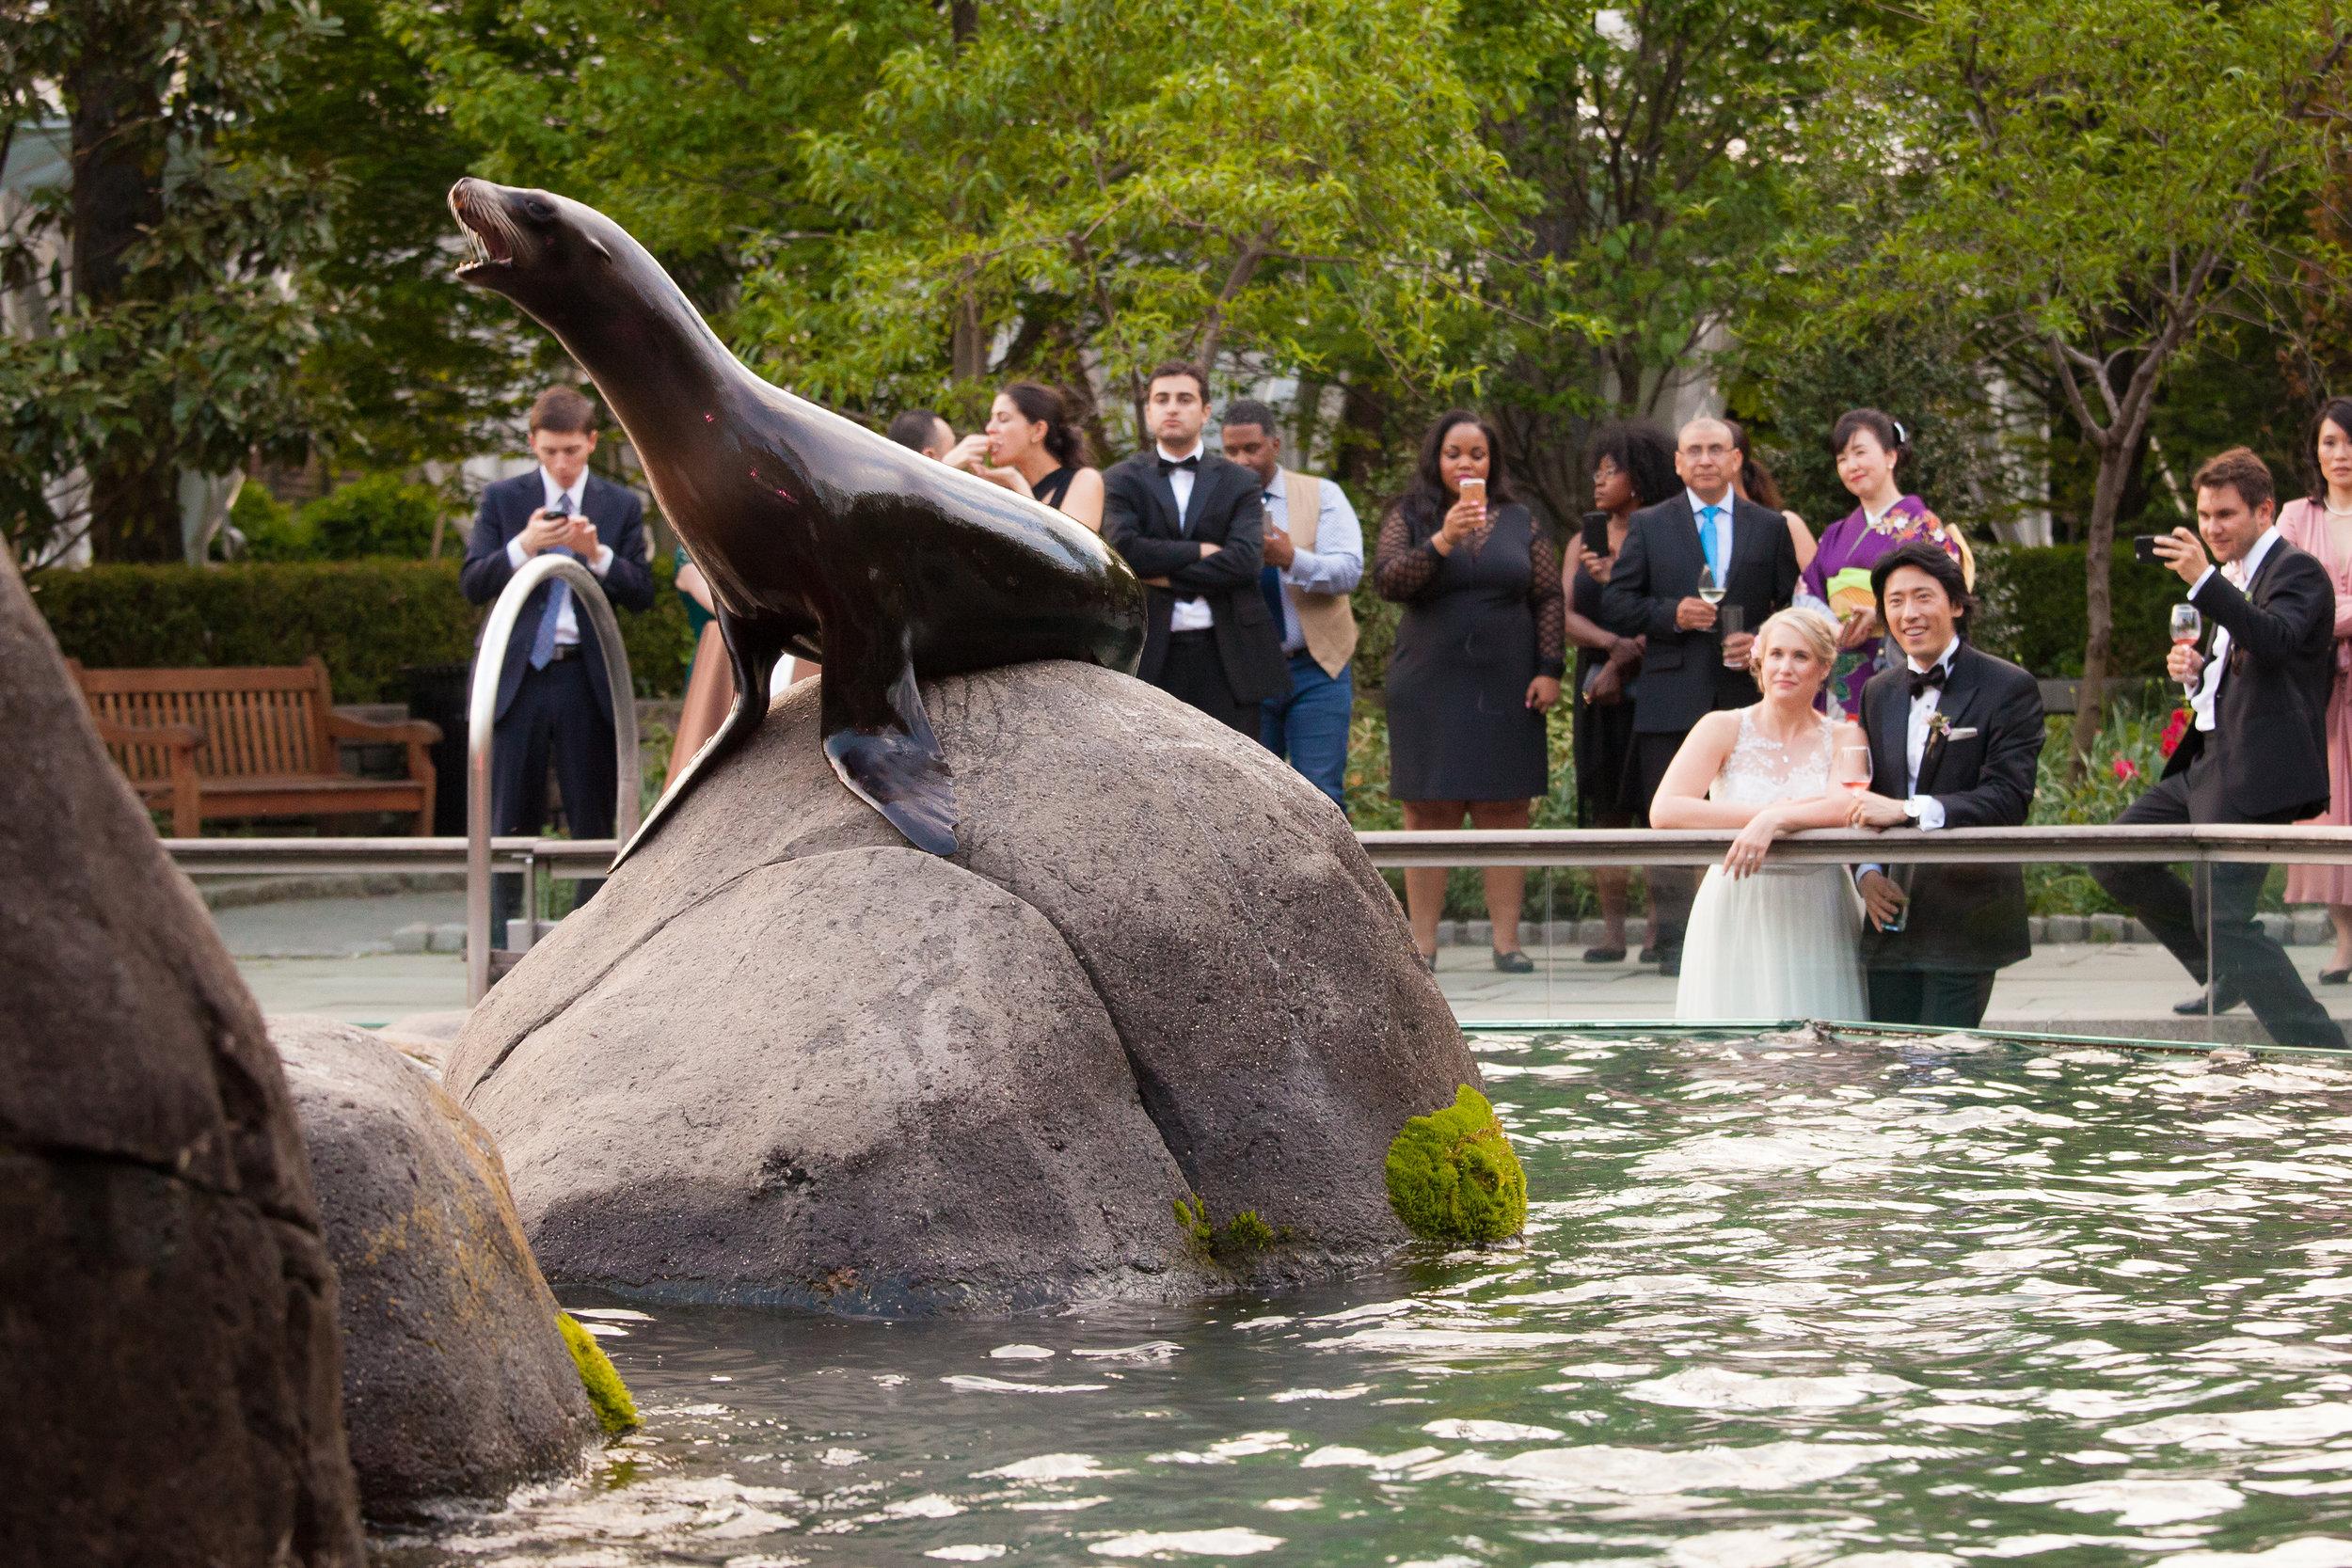 victorious-events-nyc-029-colleen-taka-central-park-zoo-wedding-raymond-hamlin.jpg